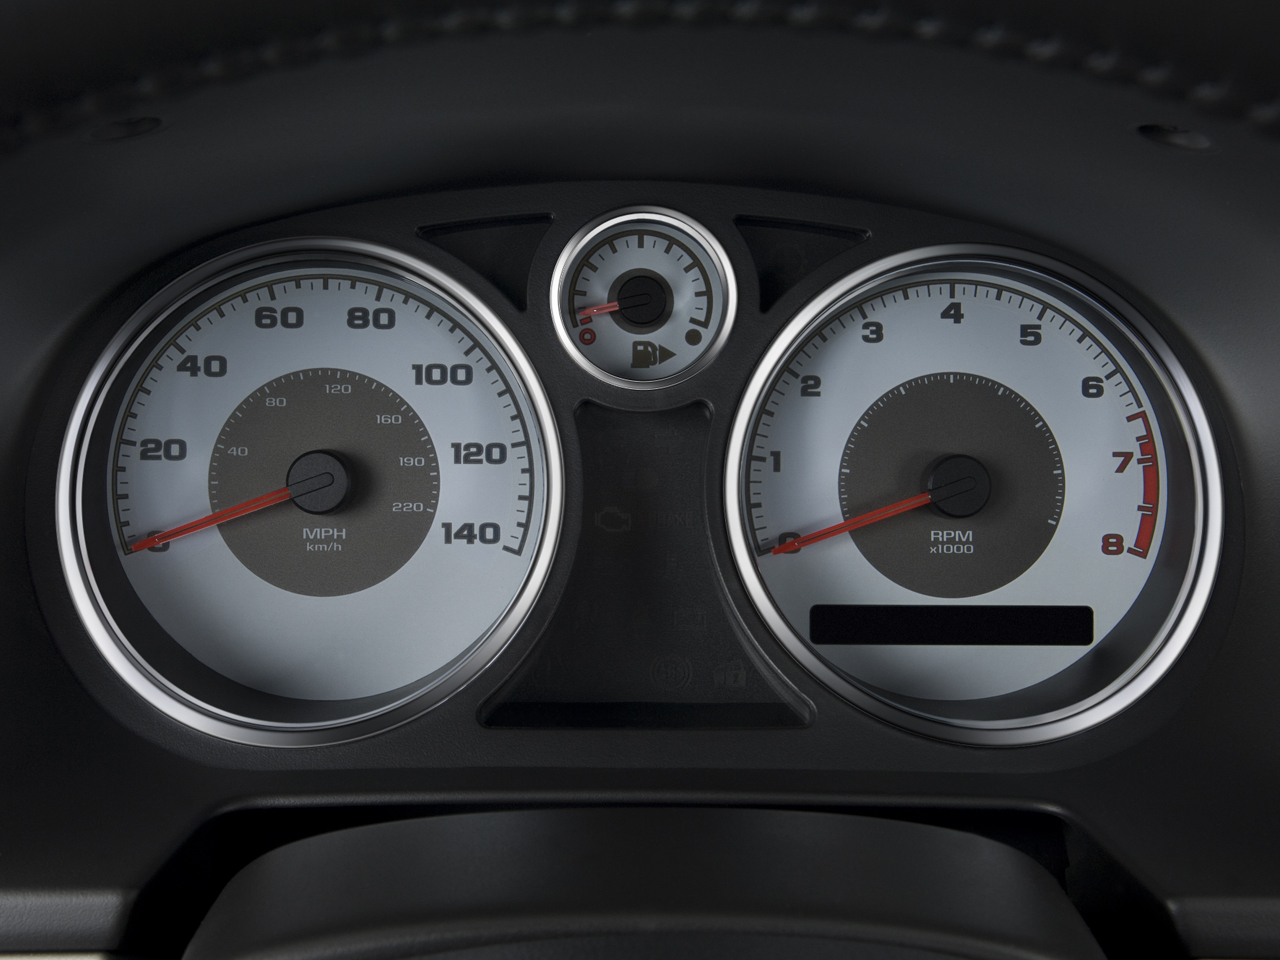 2009 Chevrolet Cruze Replaces Cobalt At Paris Motor Show Latest 2006 Chevy Ls Power Steeringinstrument Panellost 76 125